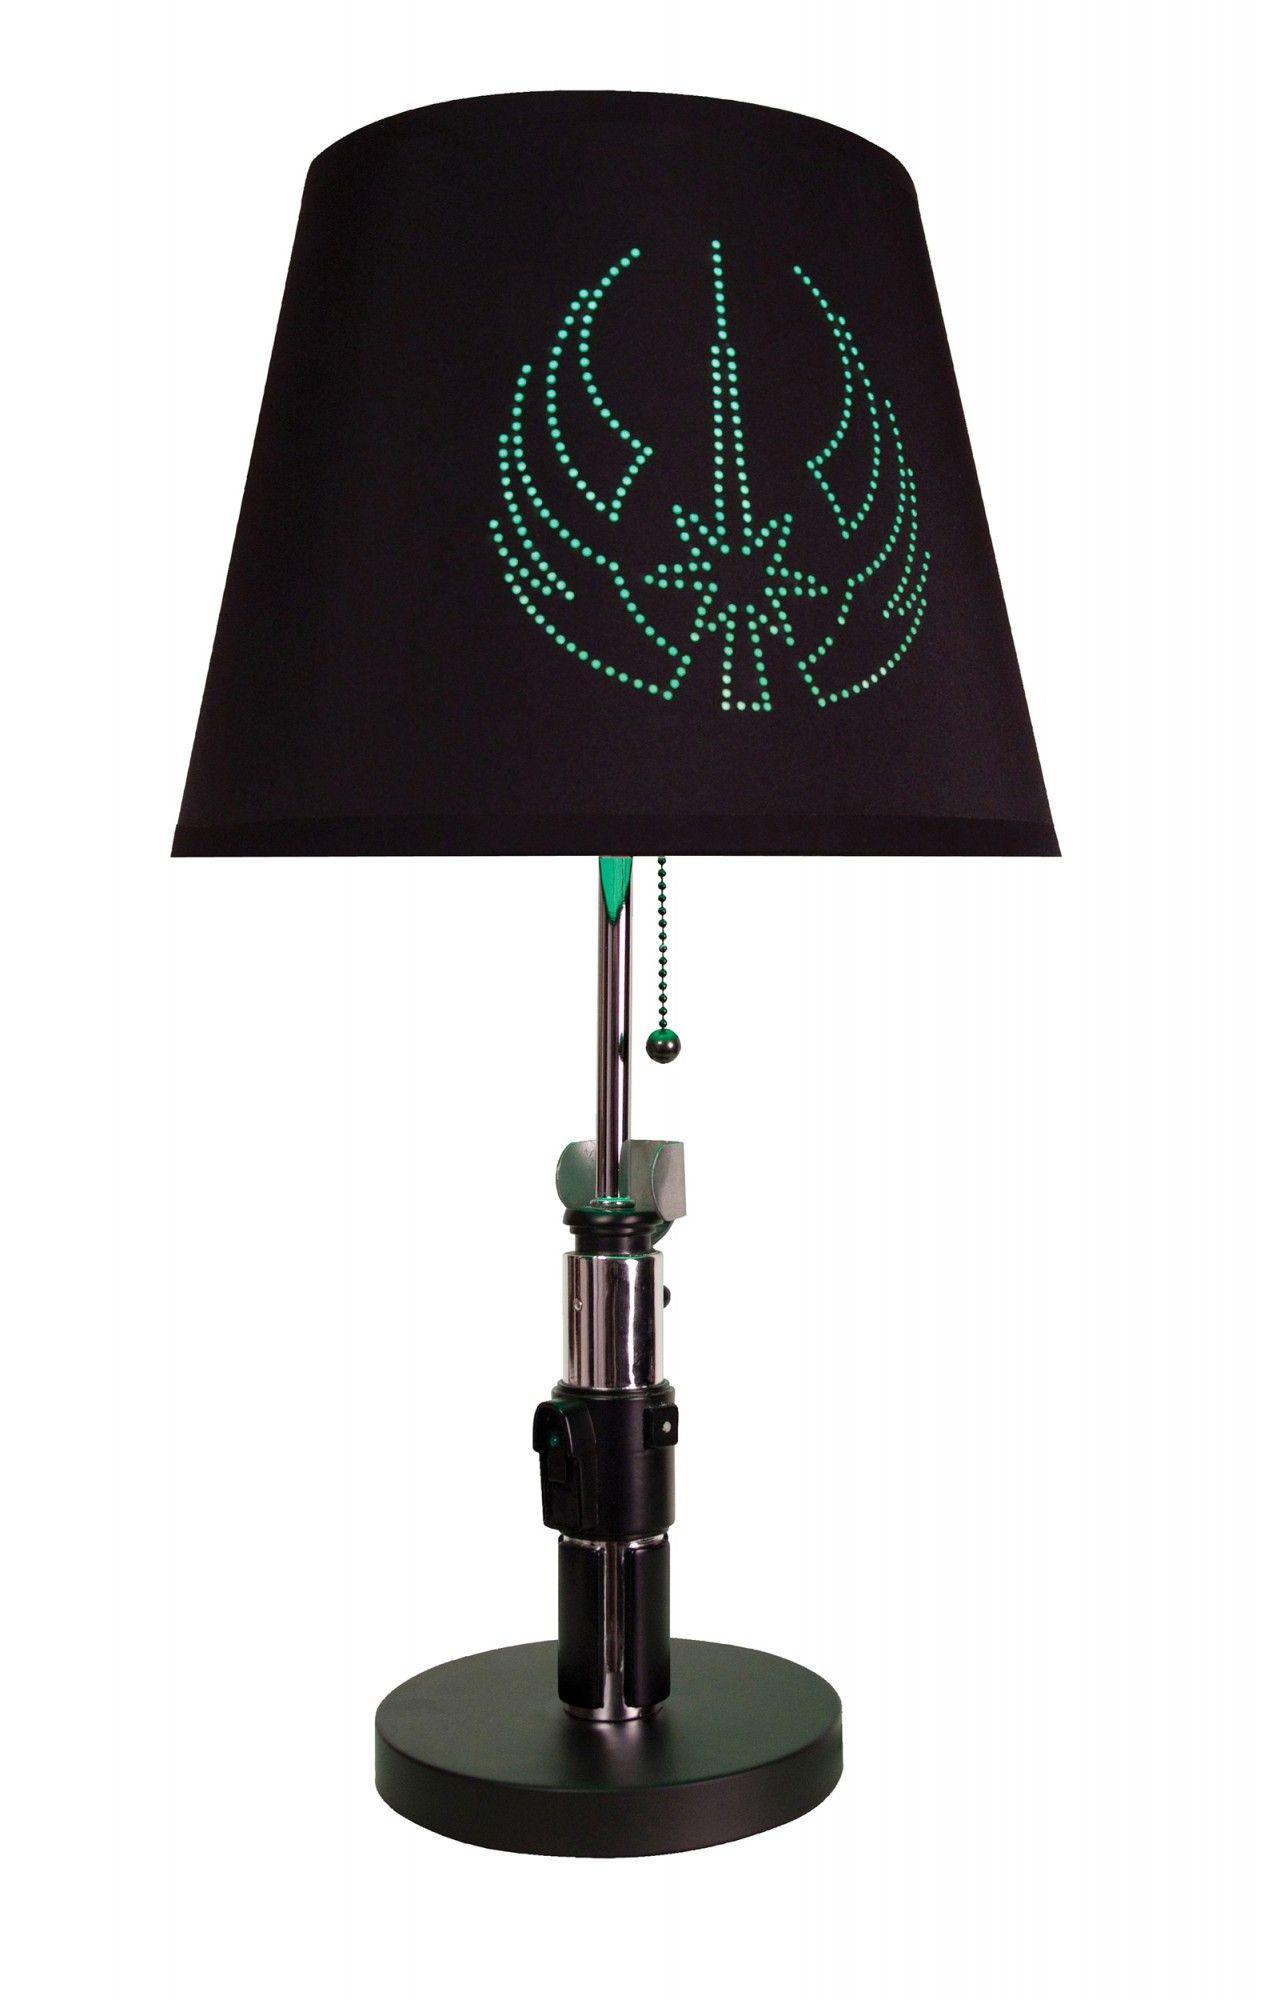 Star Wars Lightsaber Table Lamps Bring The Force To Every Room Star Wars Light Saber Star Wars Yoda Yoda Lightsaber